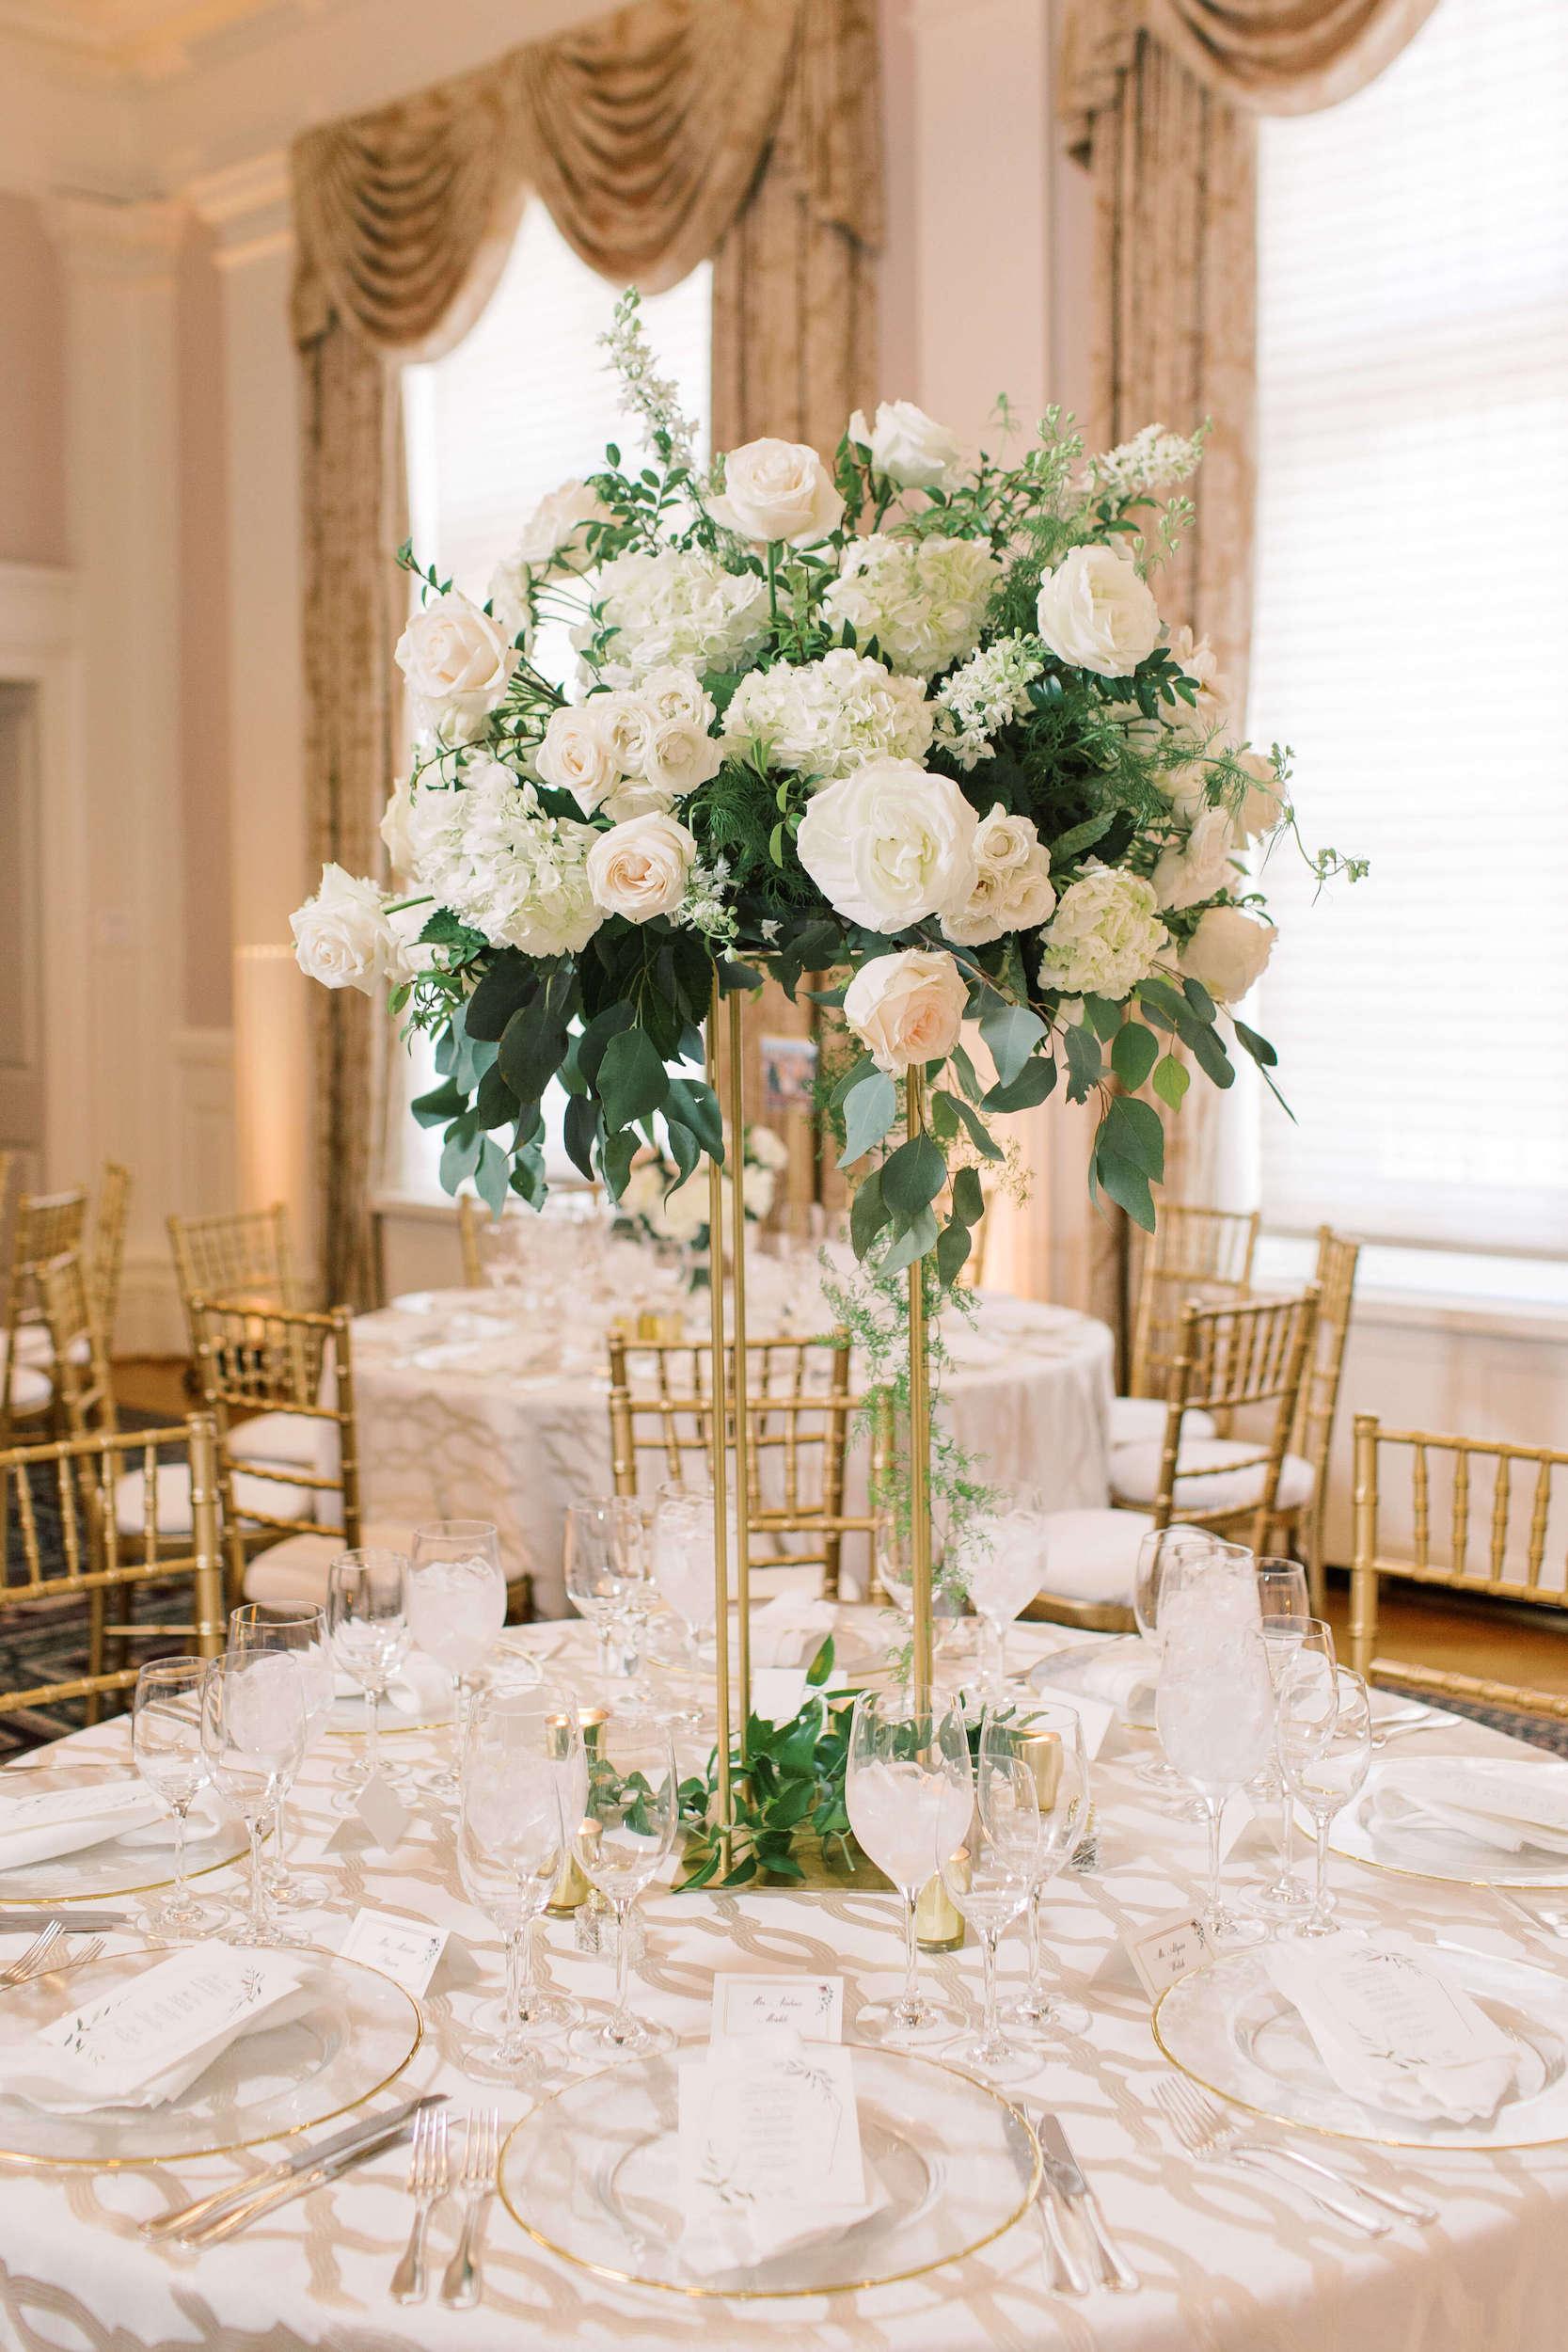 Carnegie institution for science wedding  (17).jpg